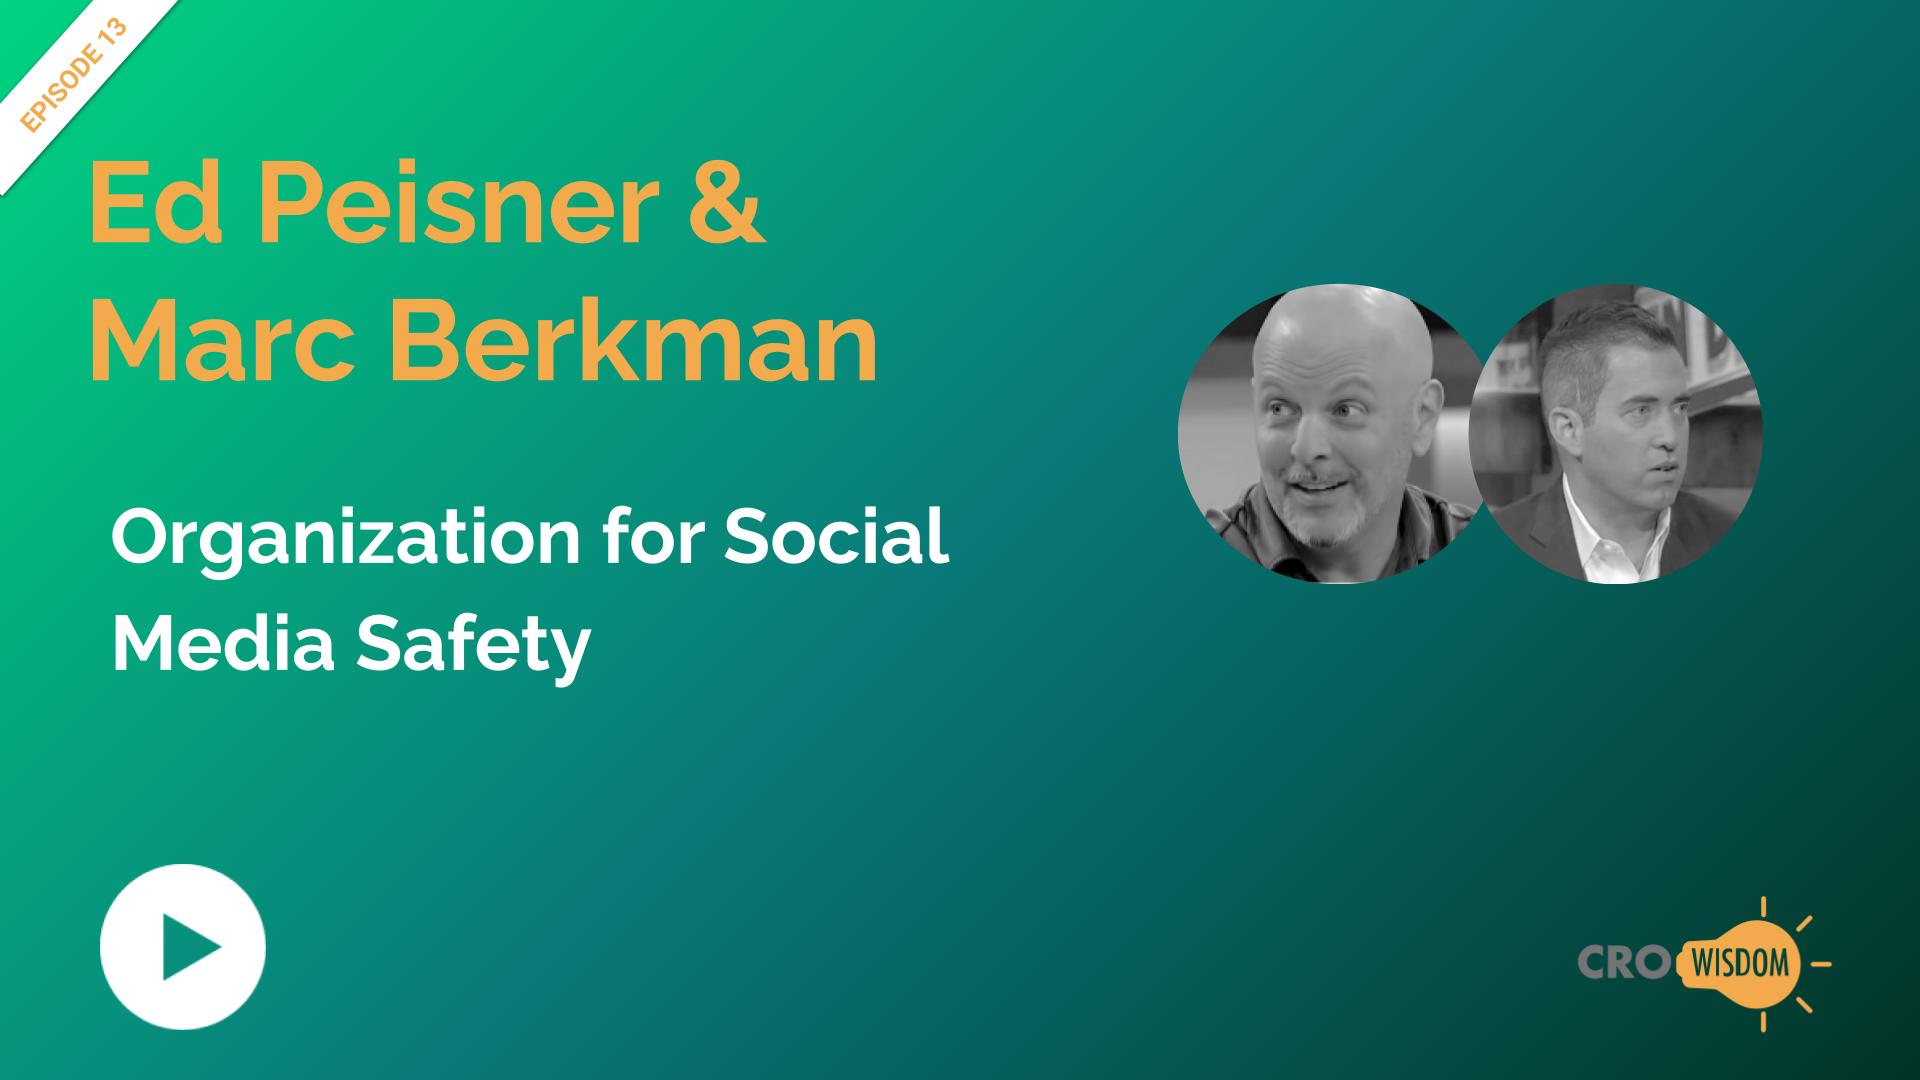 CRO Wisdom Episode 13: Ed Piesner & Mark Berkman, Organization for Social Media Safety (OFSMS)